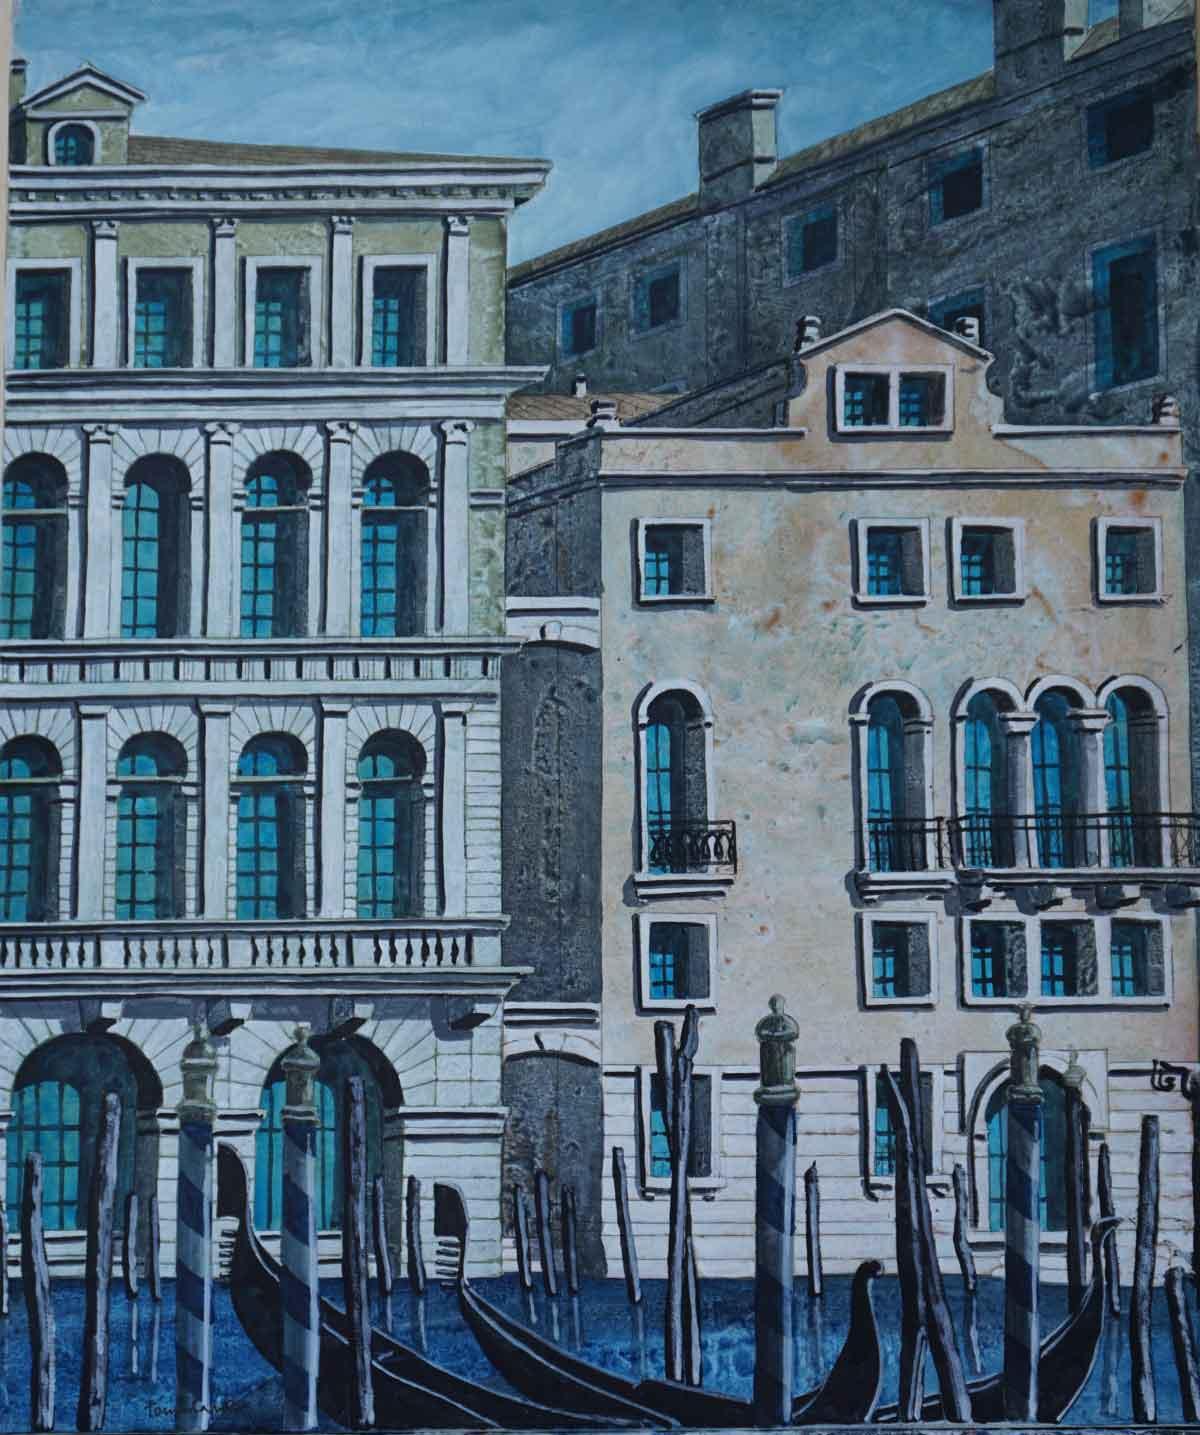 Caputo Tonino - Palazzo Moro